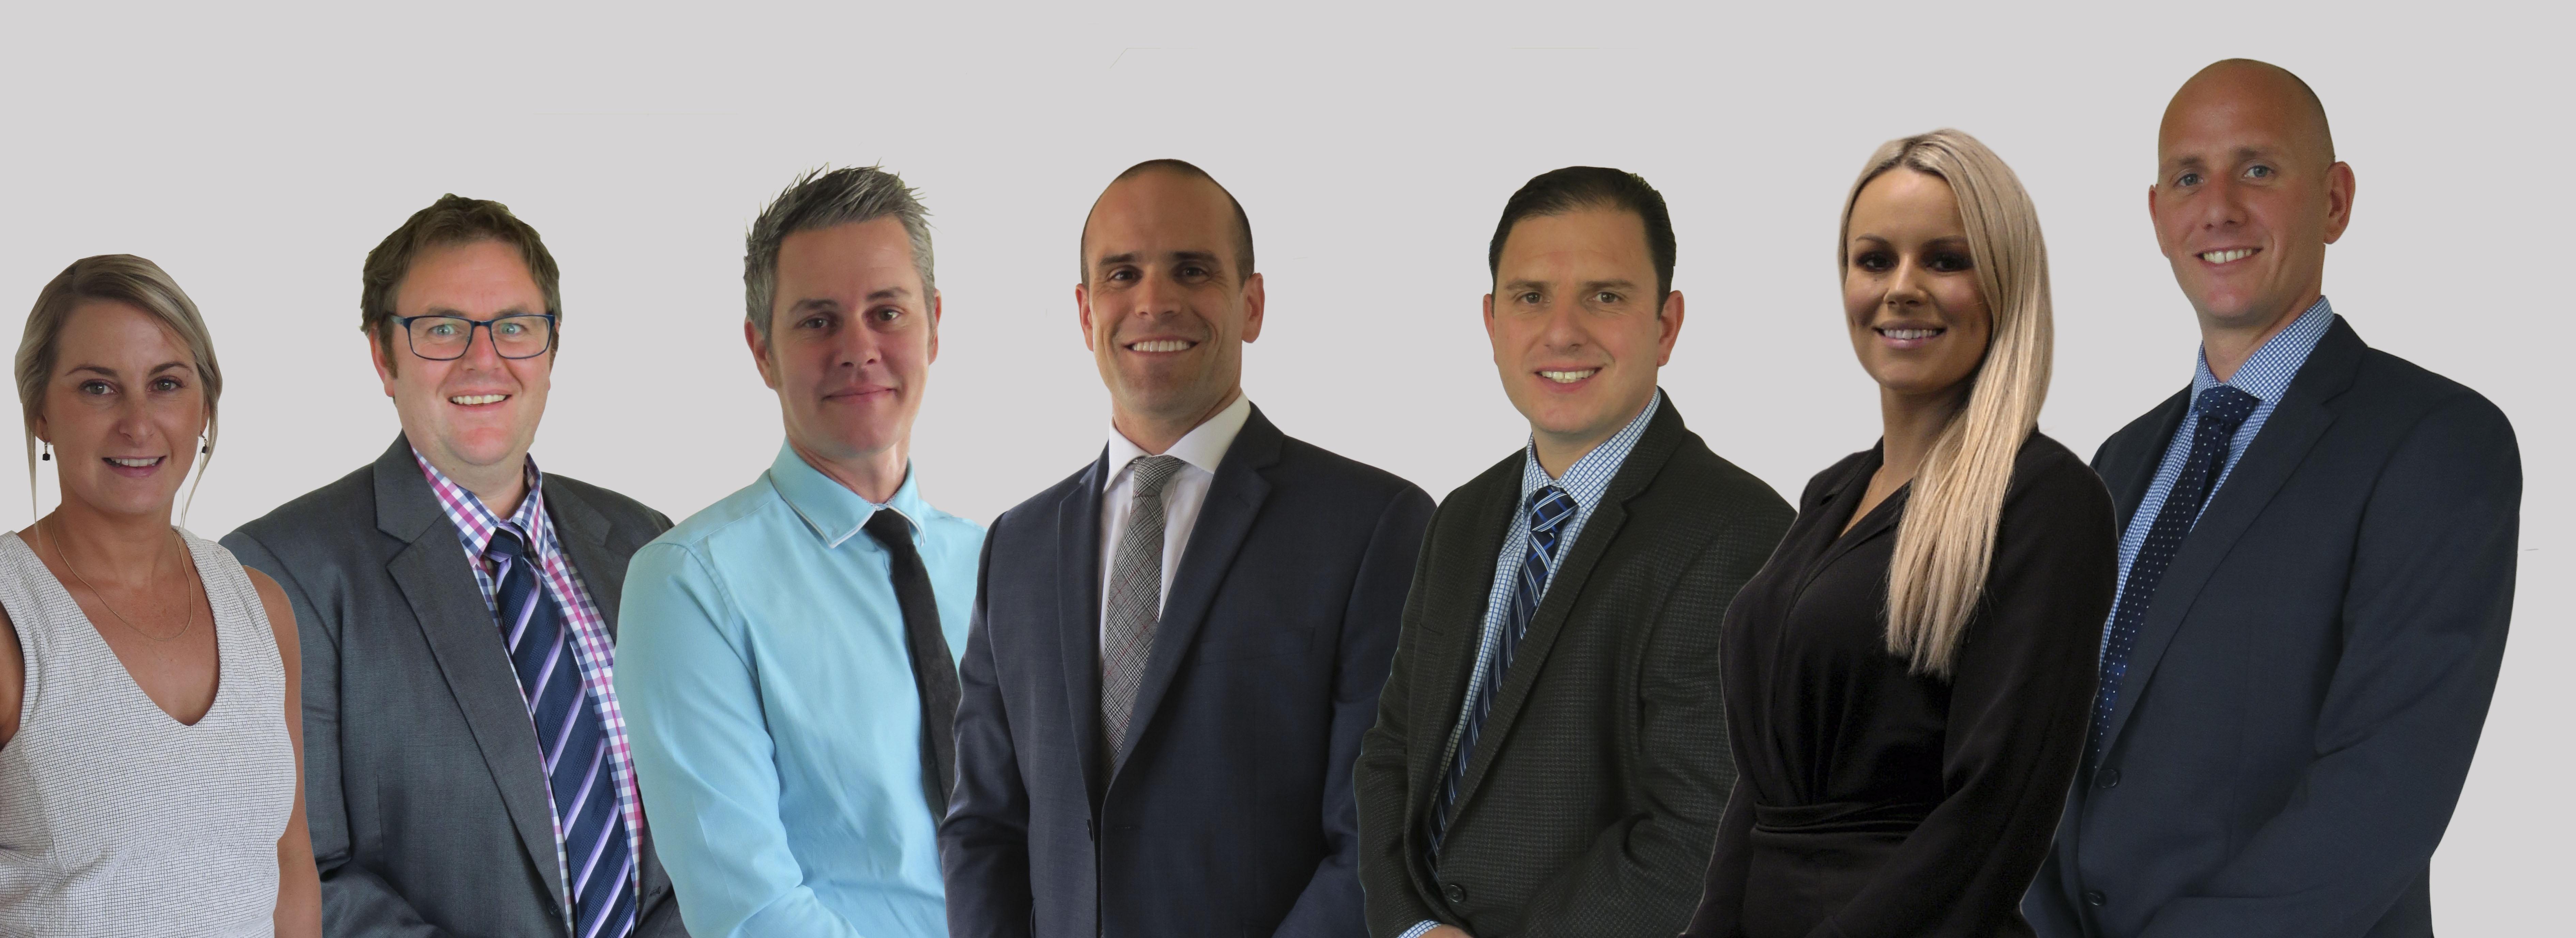 Medipak Surgical_Sales Team 2019